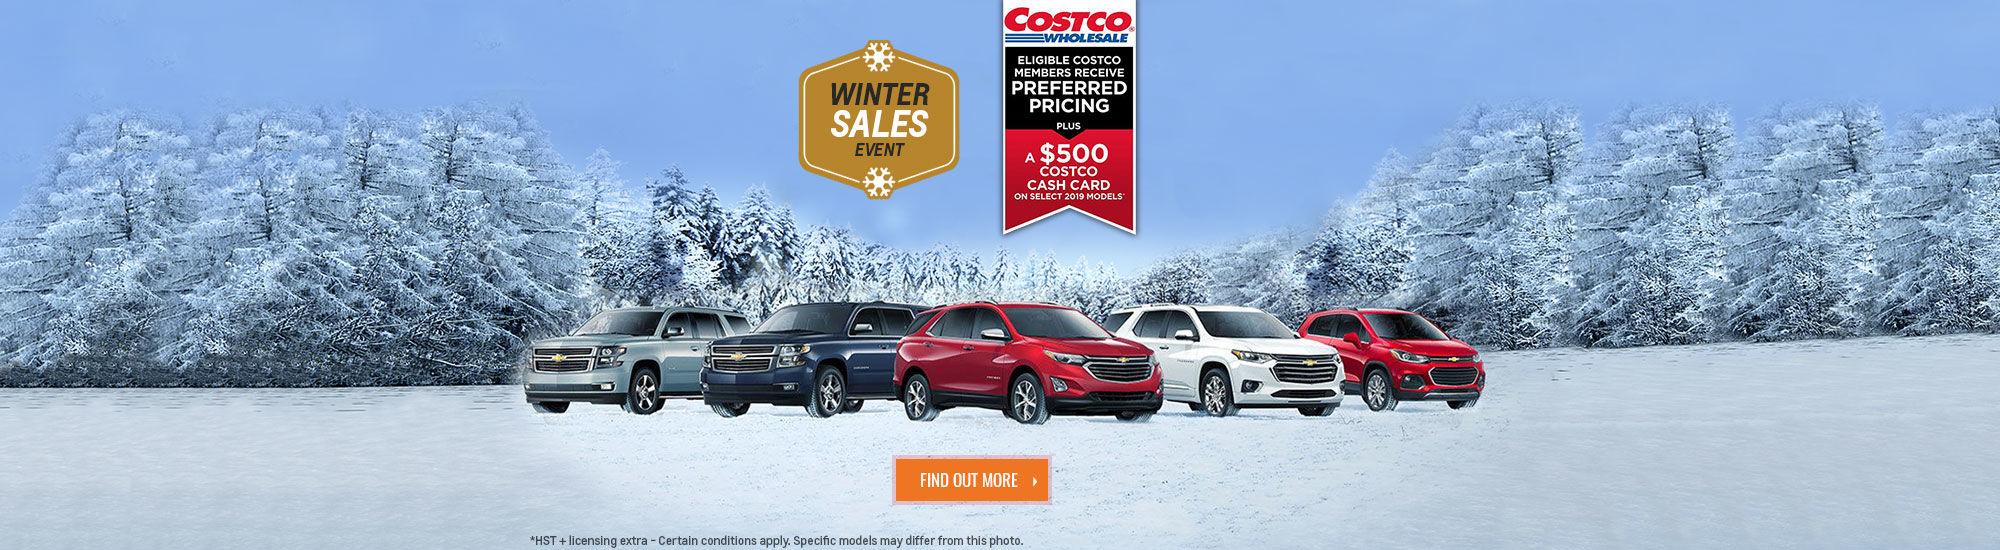 Chevrolet Costco Sales Event